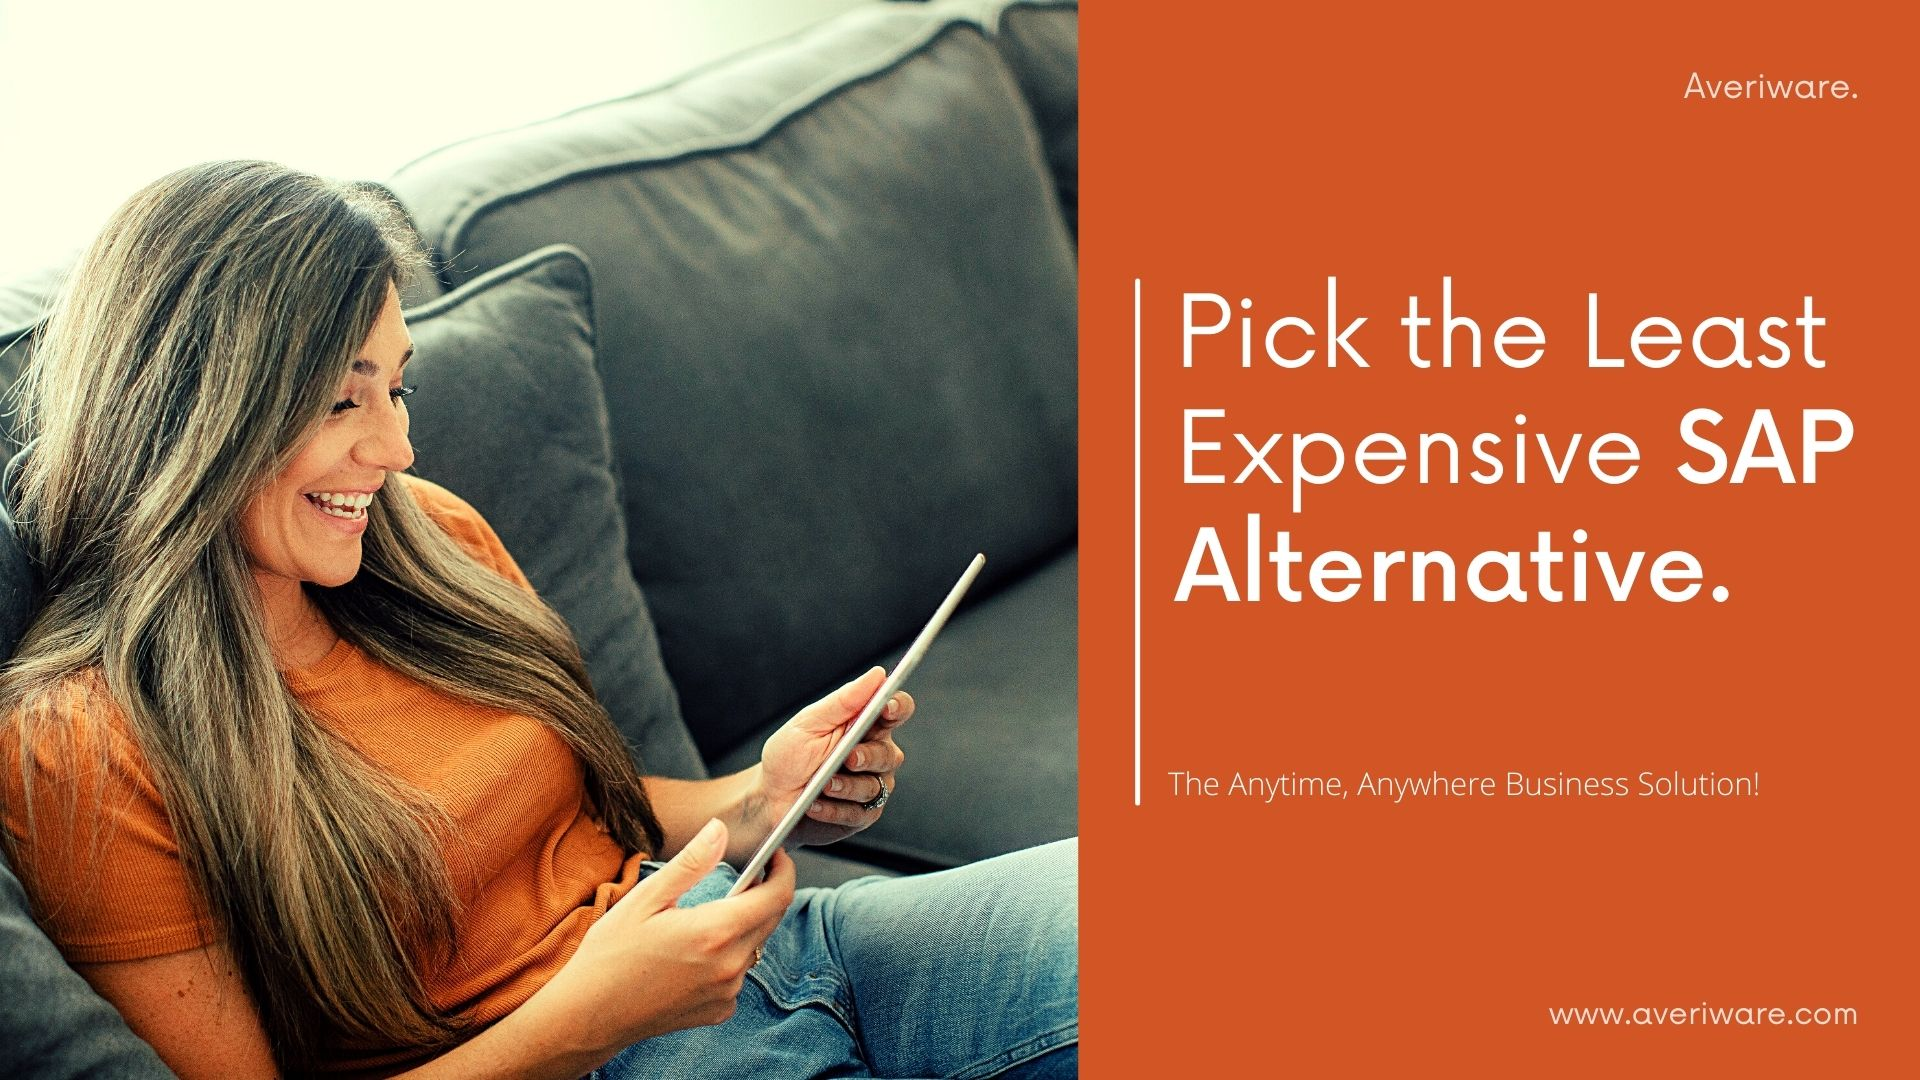 Pick the Least Expensive SAP Alternative.